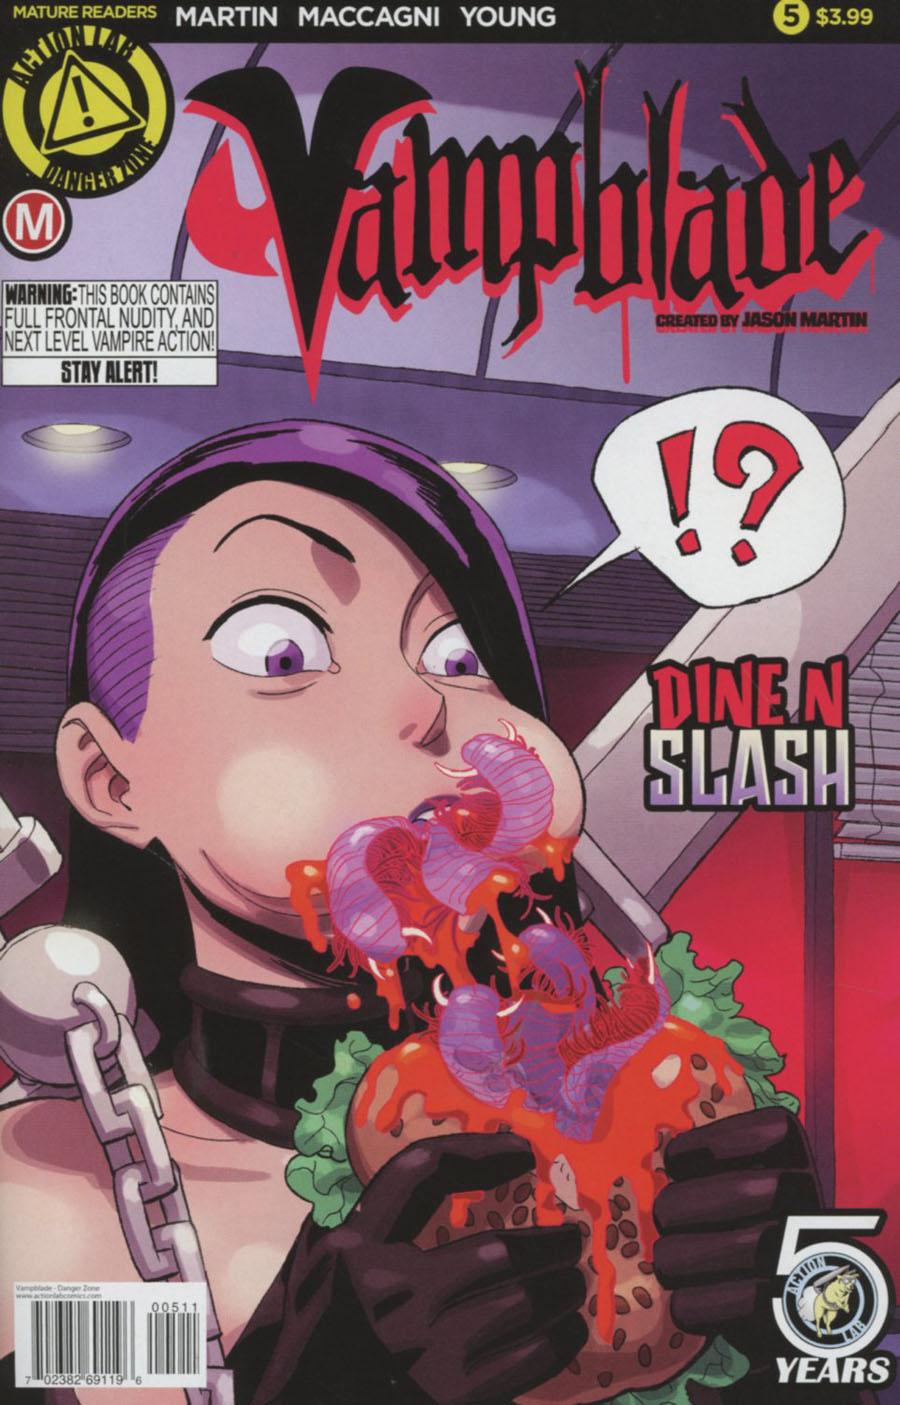 Vampblade #5 Cover A Regular Winston Young Cover